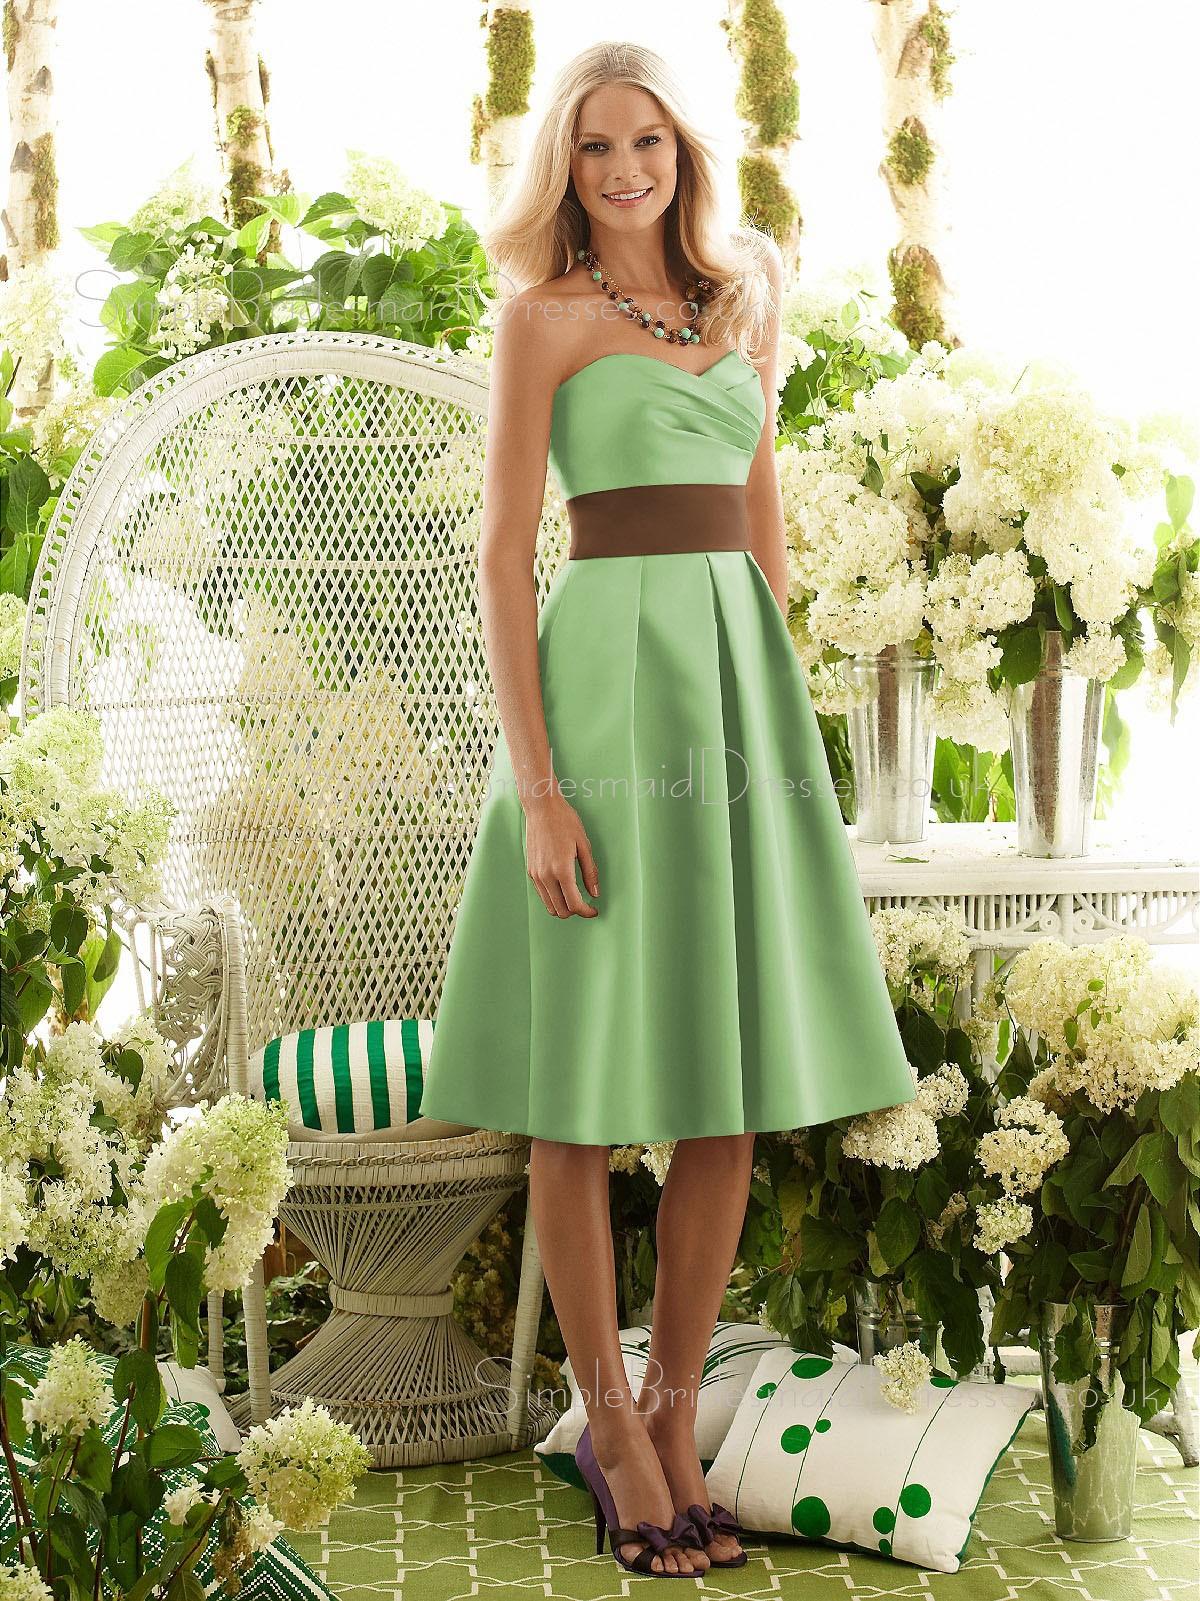 Green bridesmaid dresses uk green bridesmaid dresses uk 75 ombrellifo Images